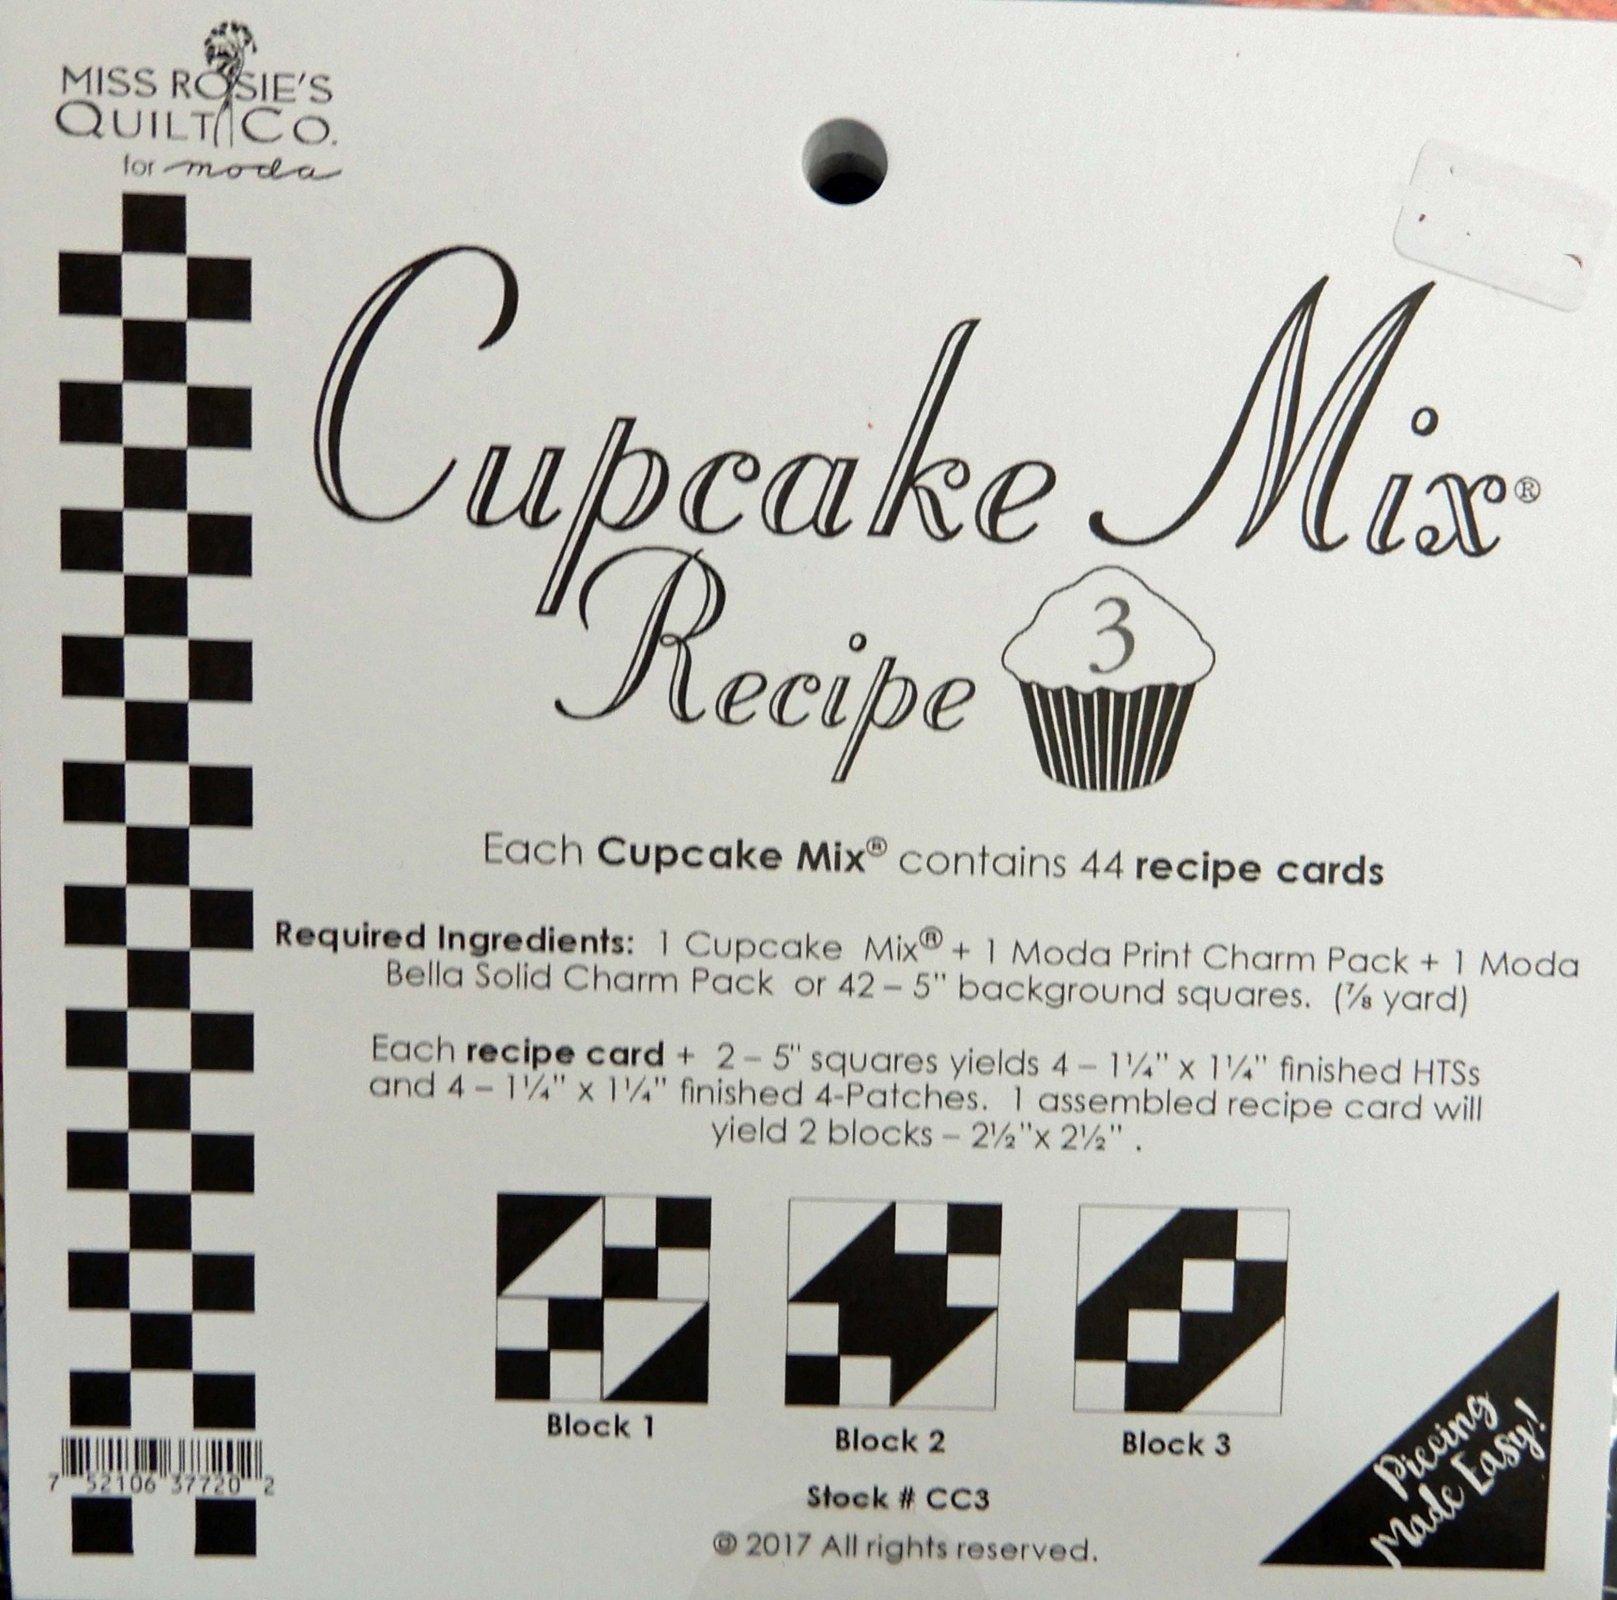 Cupcake Recipe volume 3